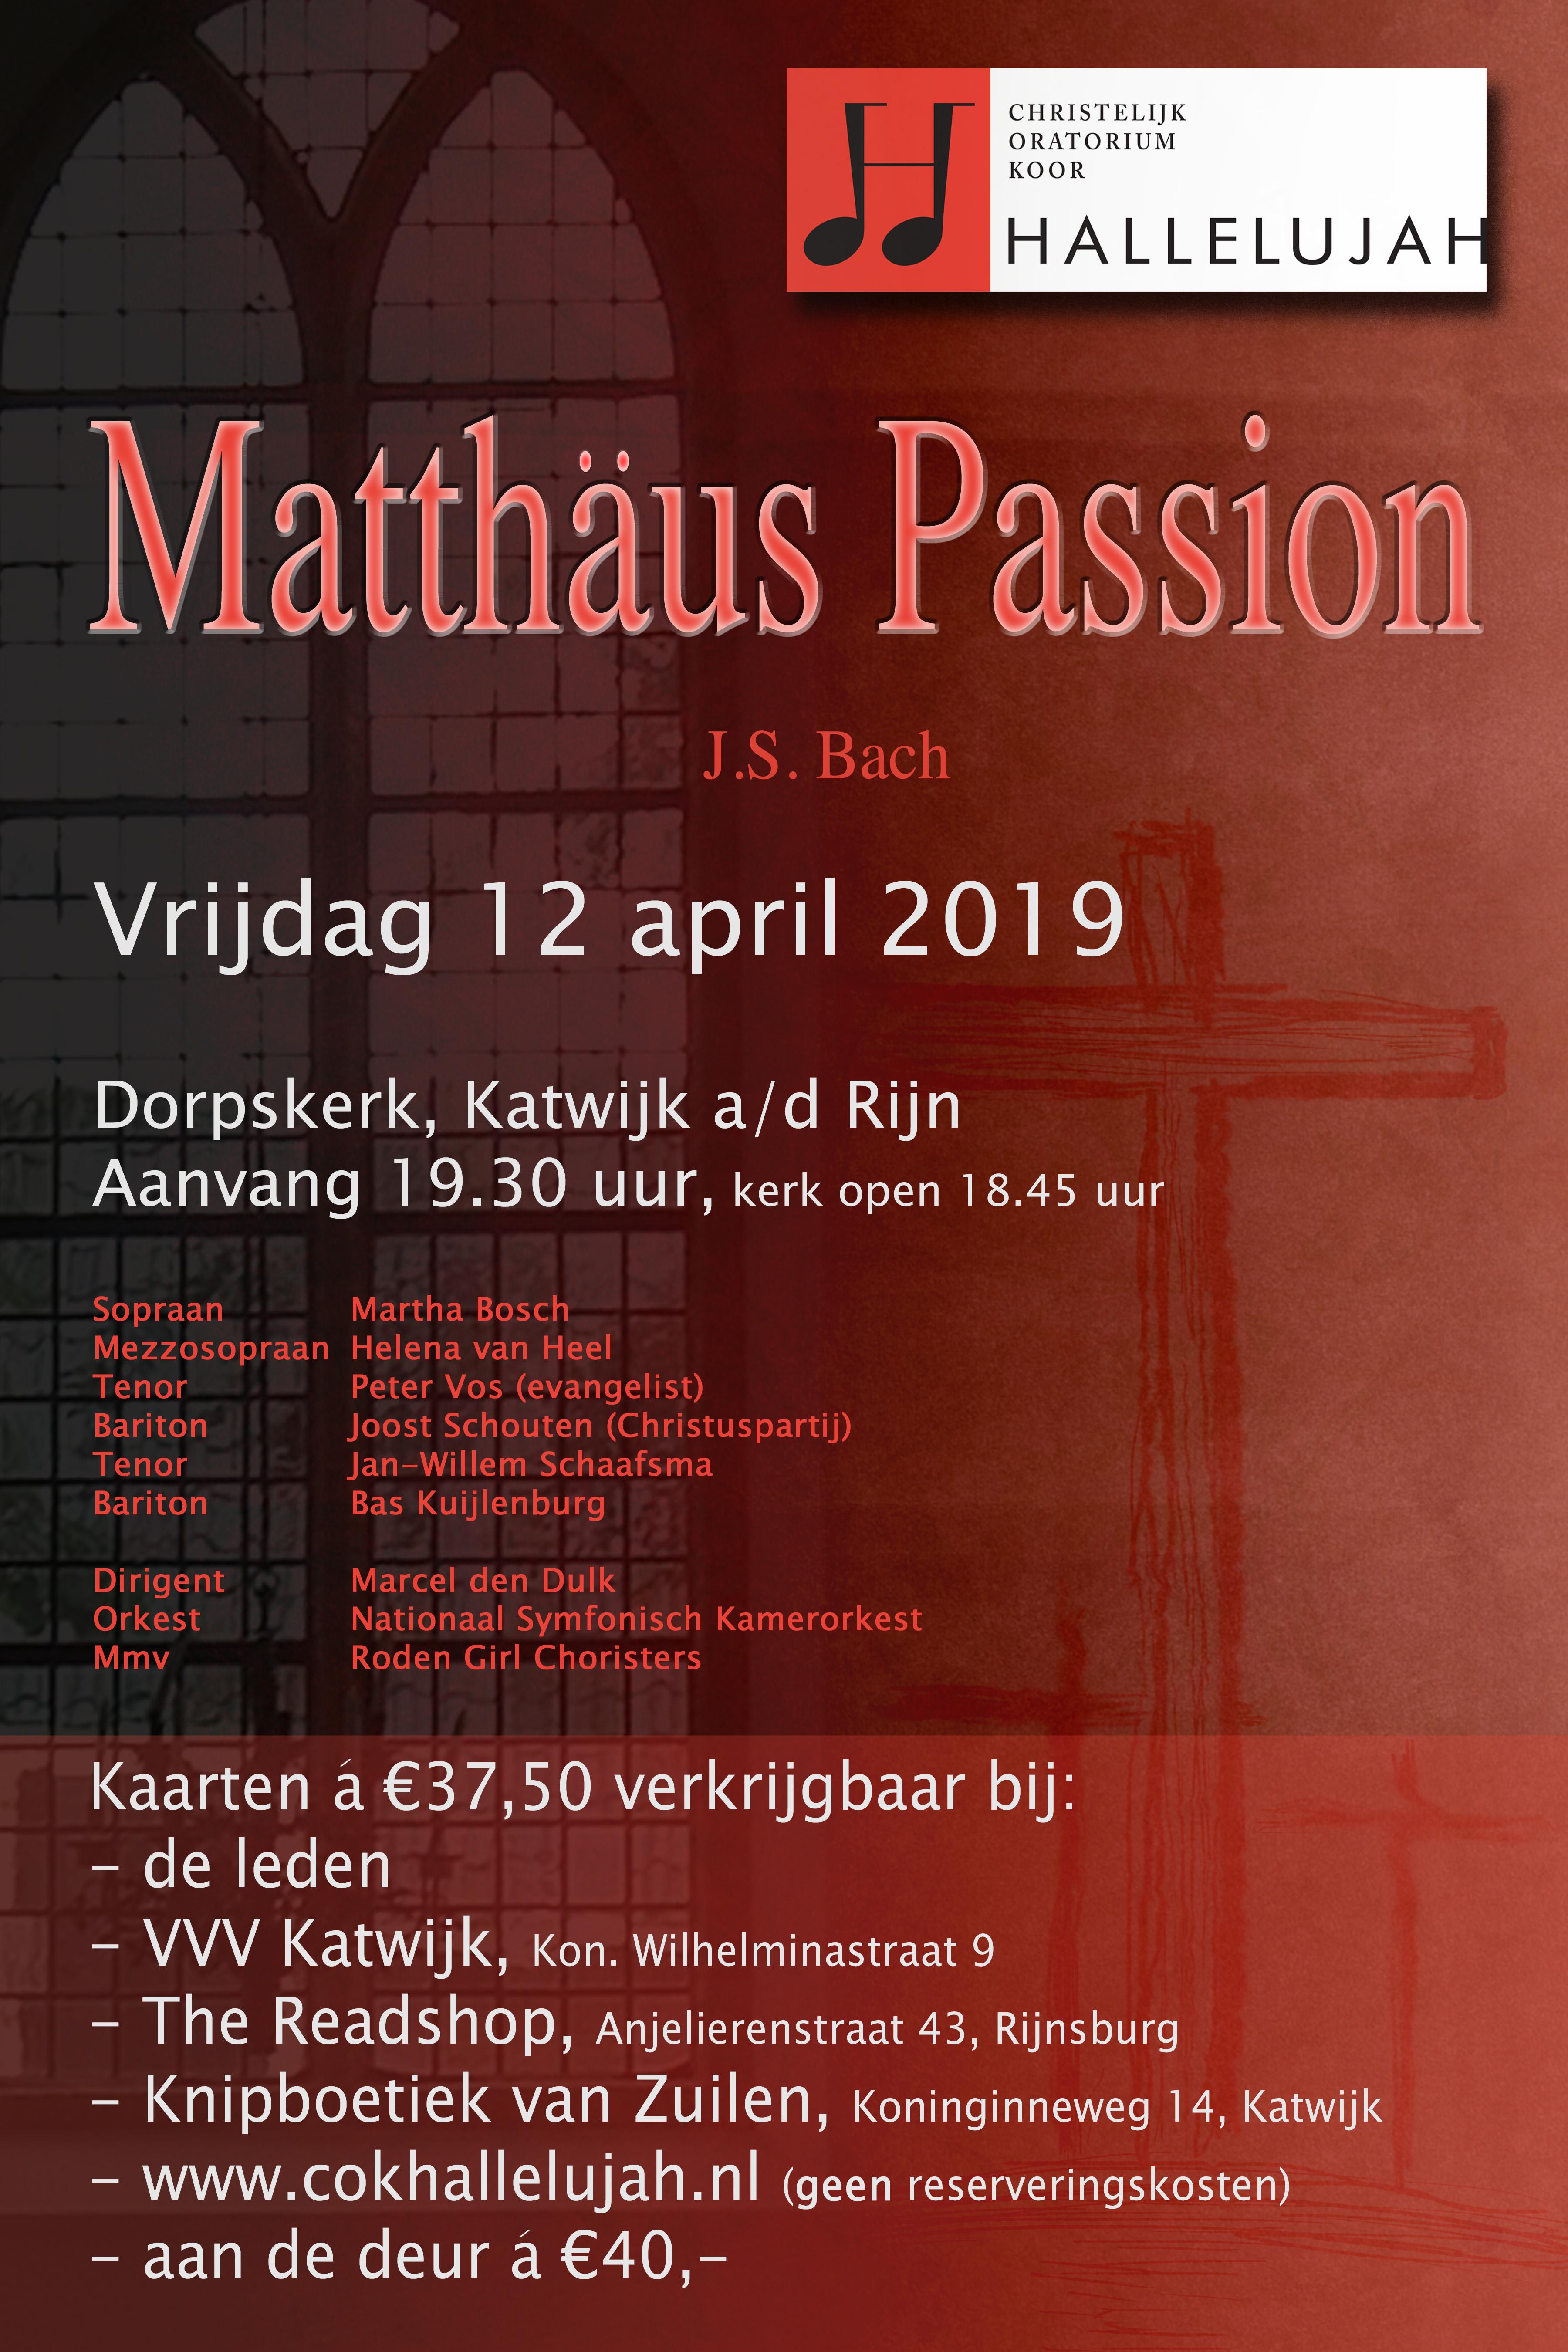 Matthäus Passion – J.S. Bach